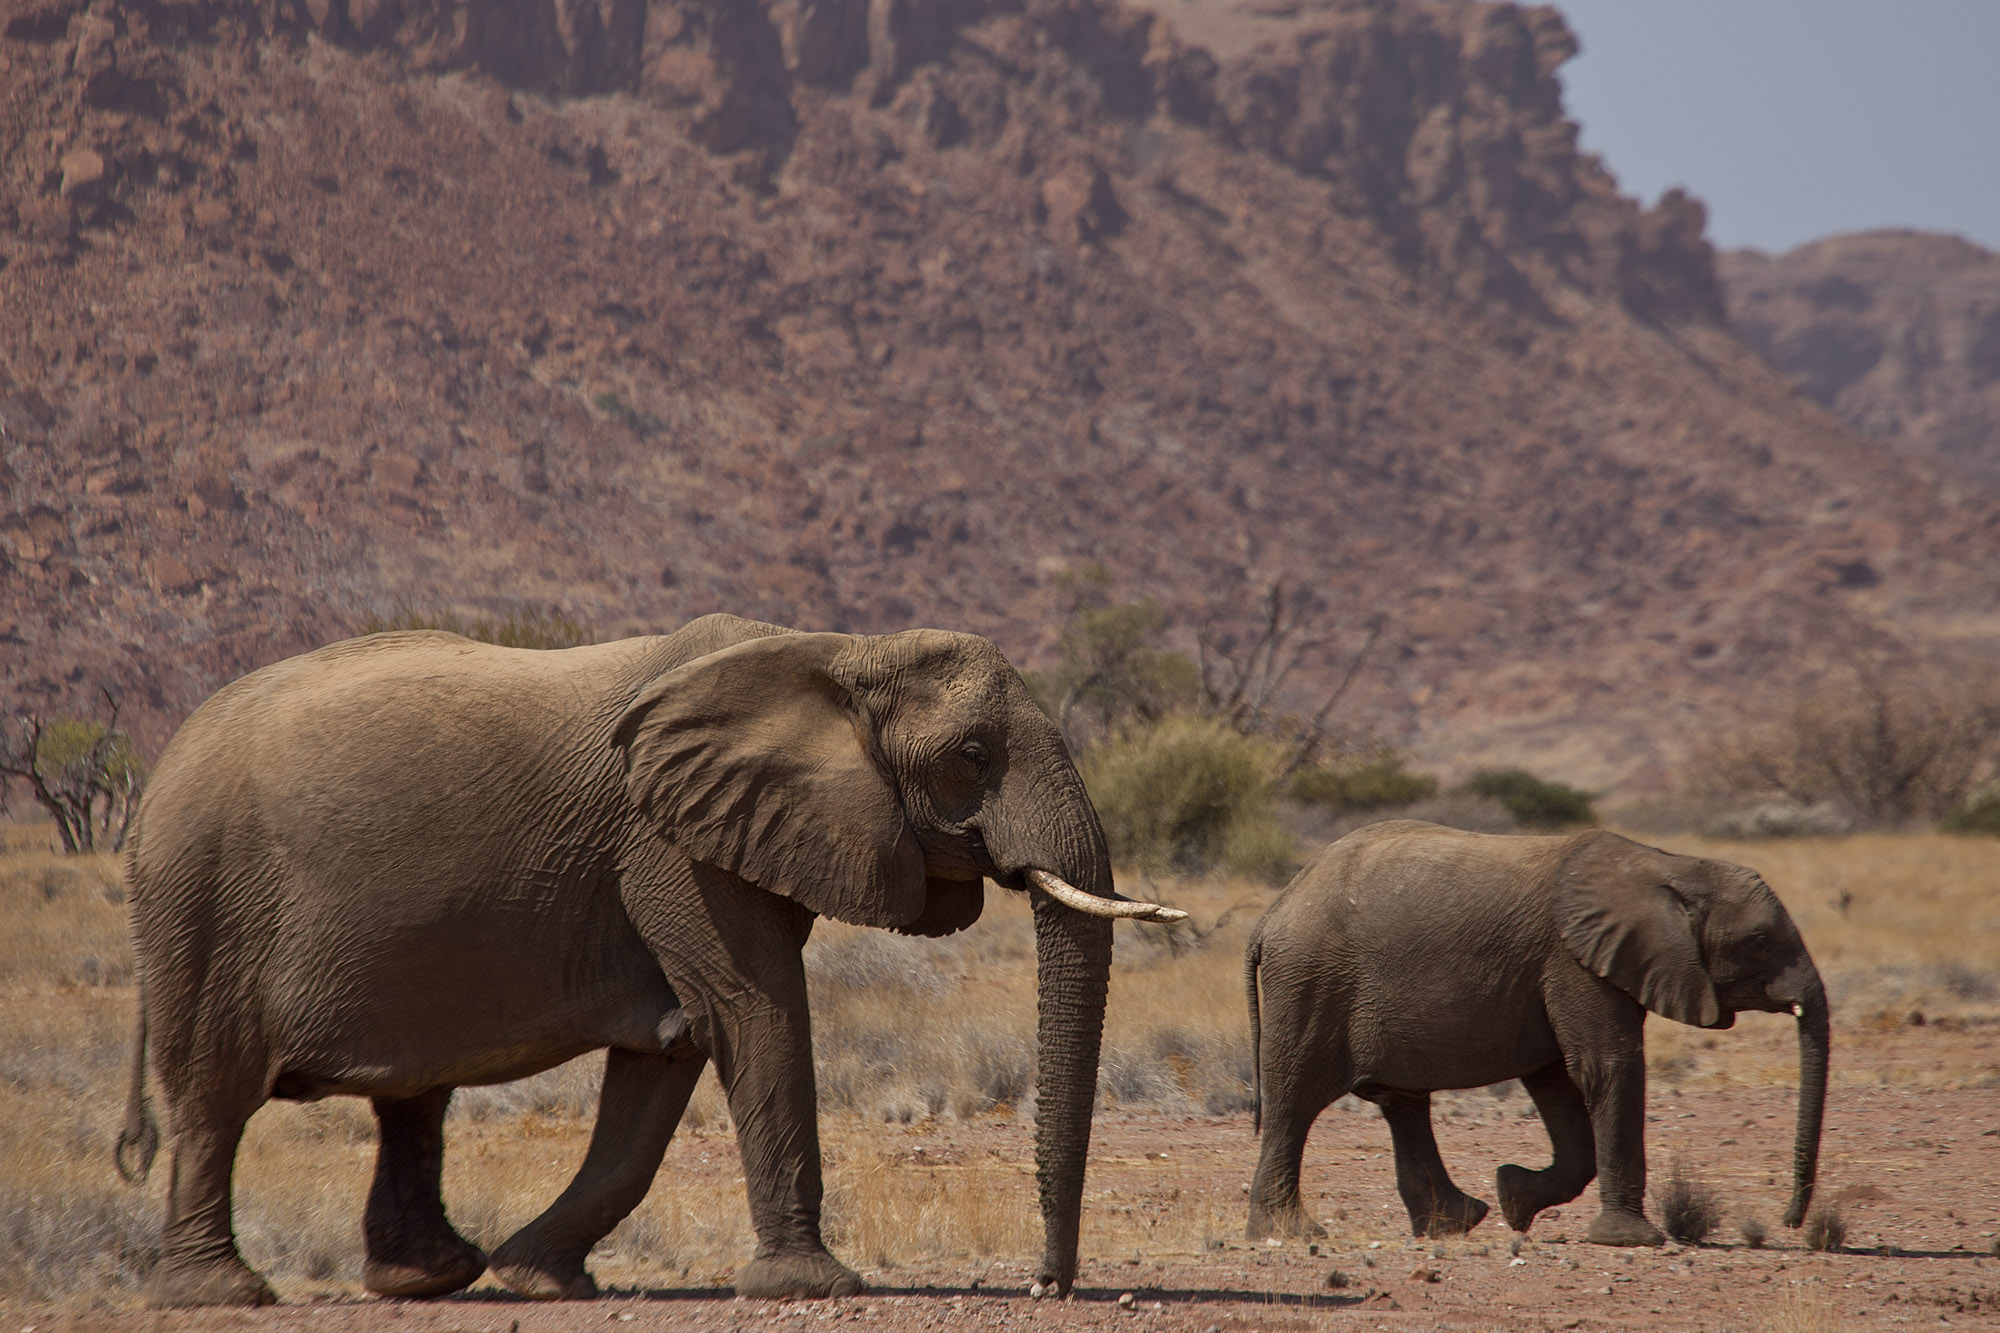 Elephants against the mountain backdrop